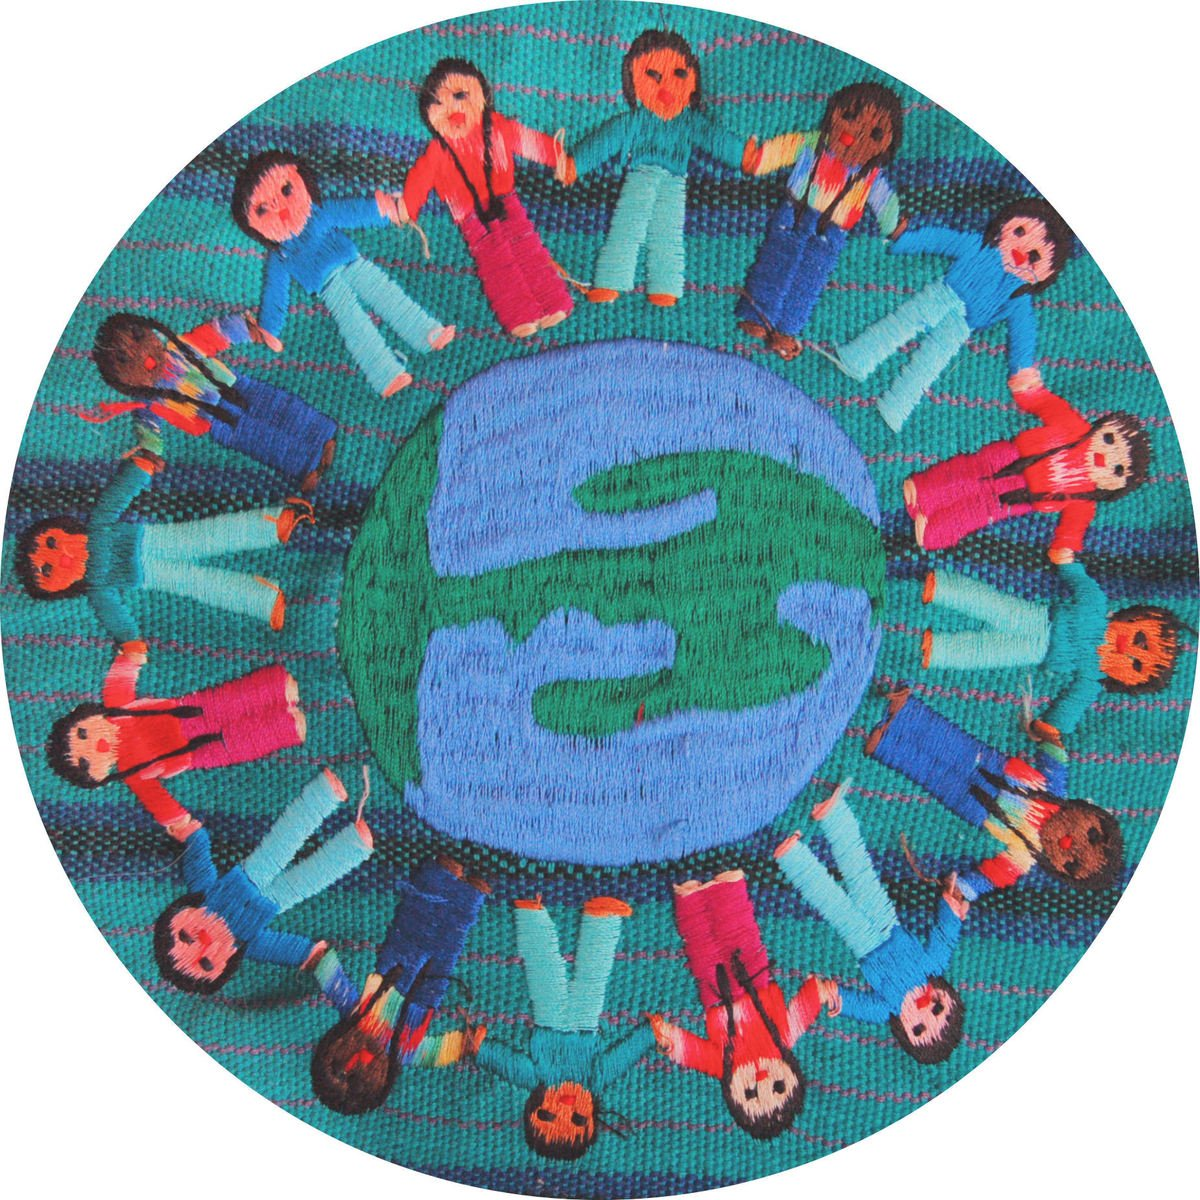 RT @ABADiversity: Love yourself.  Love differences.  Love diversity. #HappyValentine'sDay https://t.co/04NVlynJsV